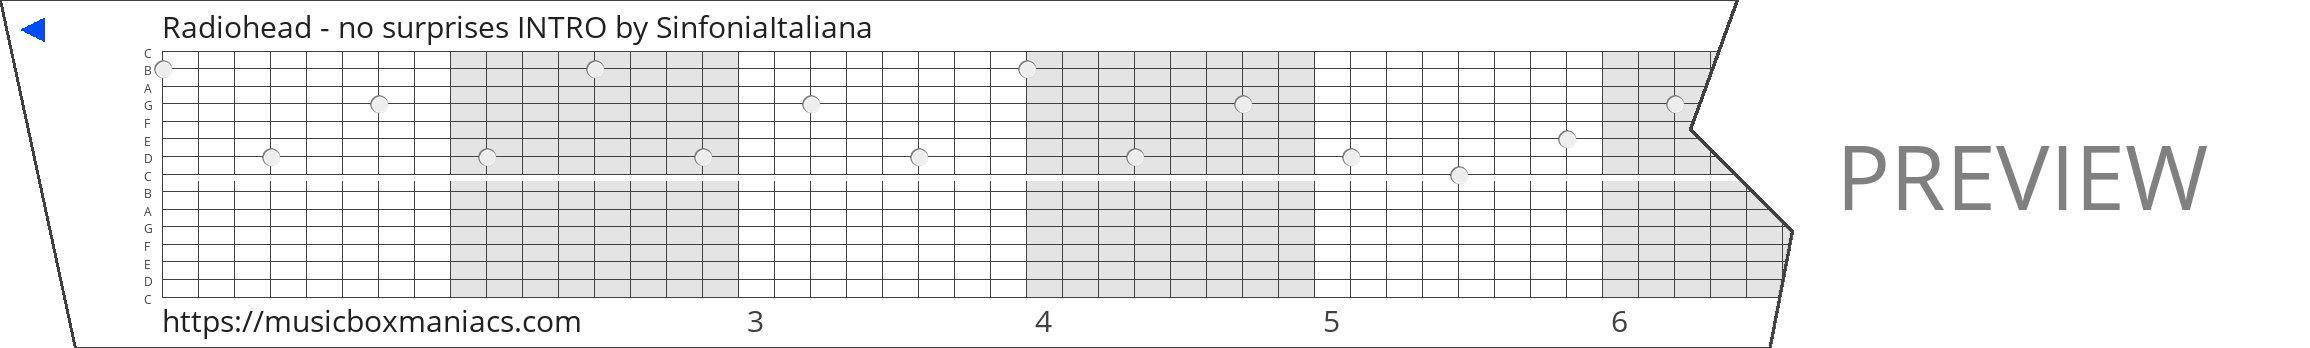 Radiohead - no surprises INTRO 15 note music box paper strip